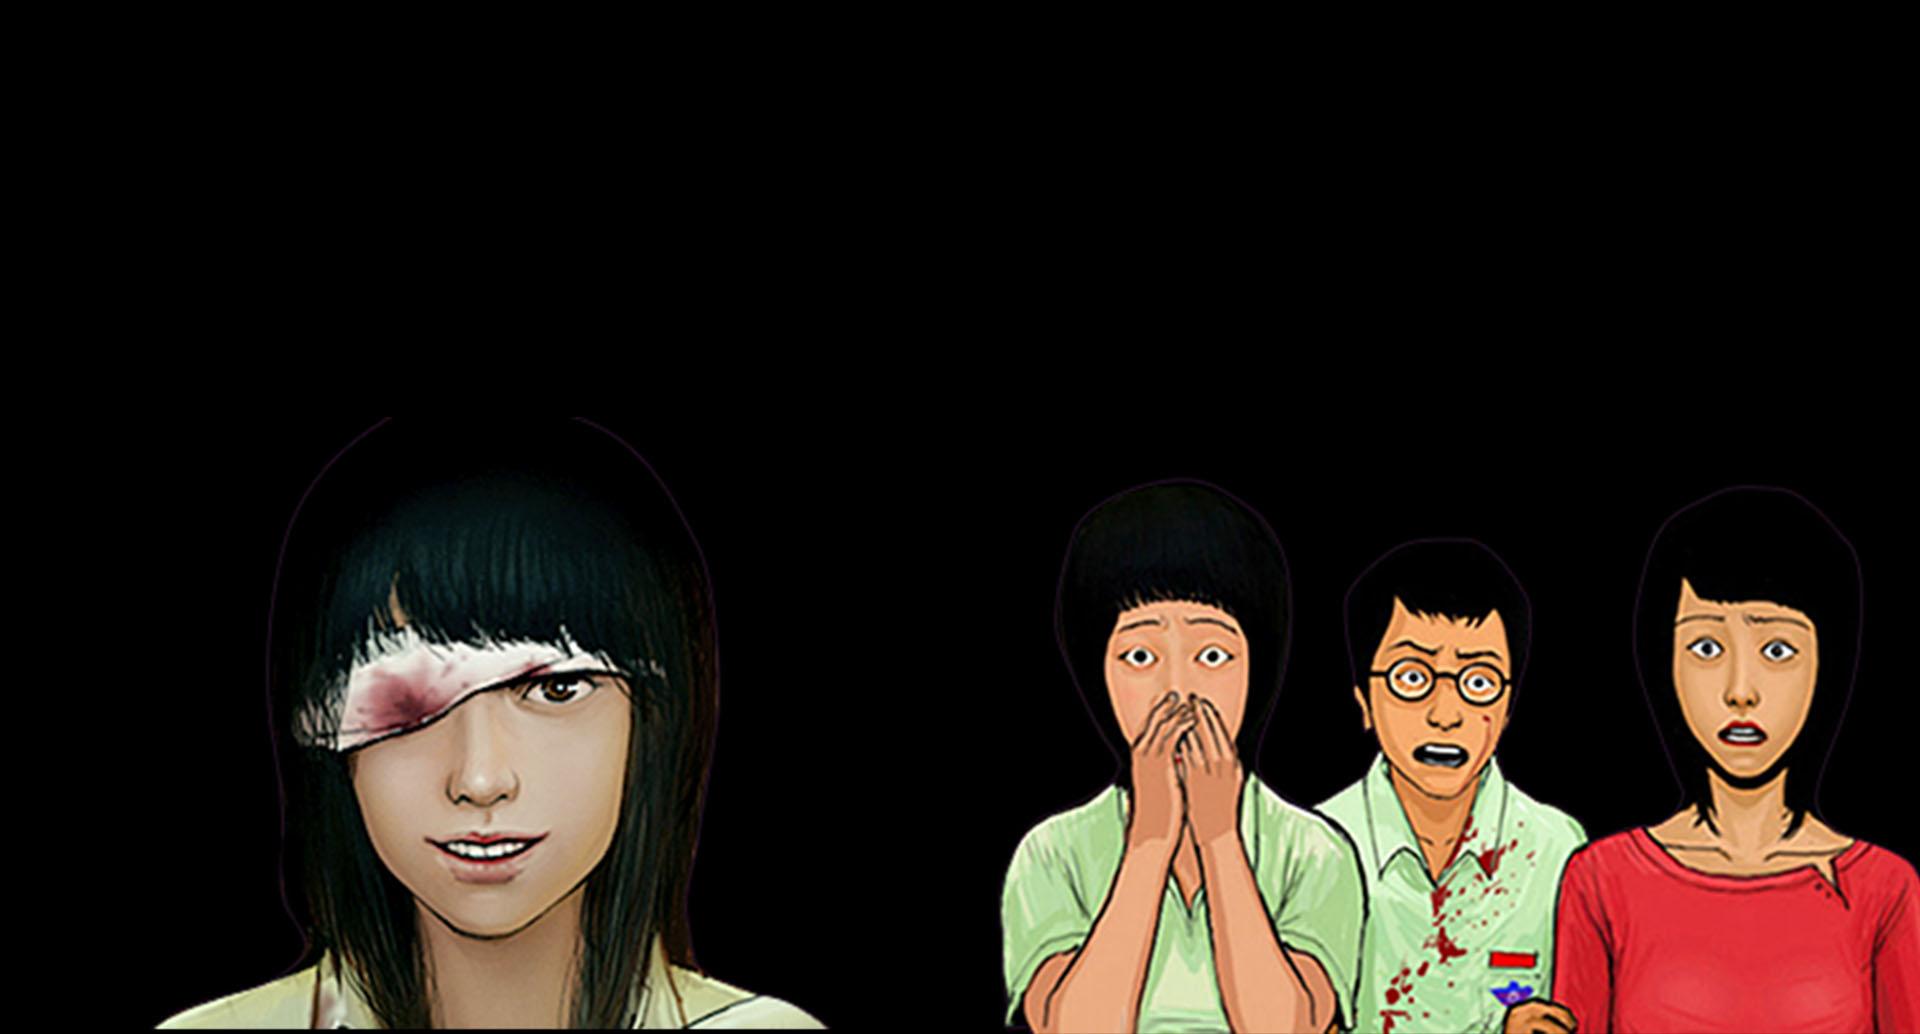 Netflix orders new Zombie Series based on popular South Korean webtoon 'Now At Our School'.